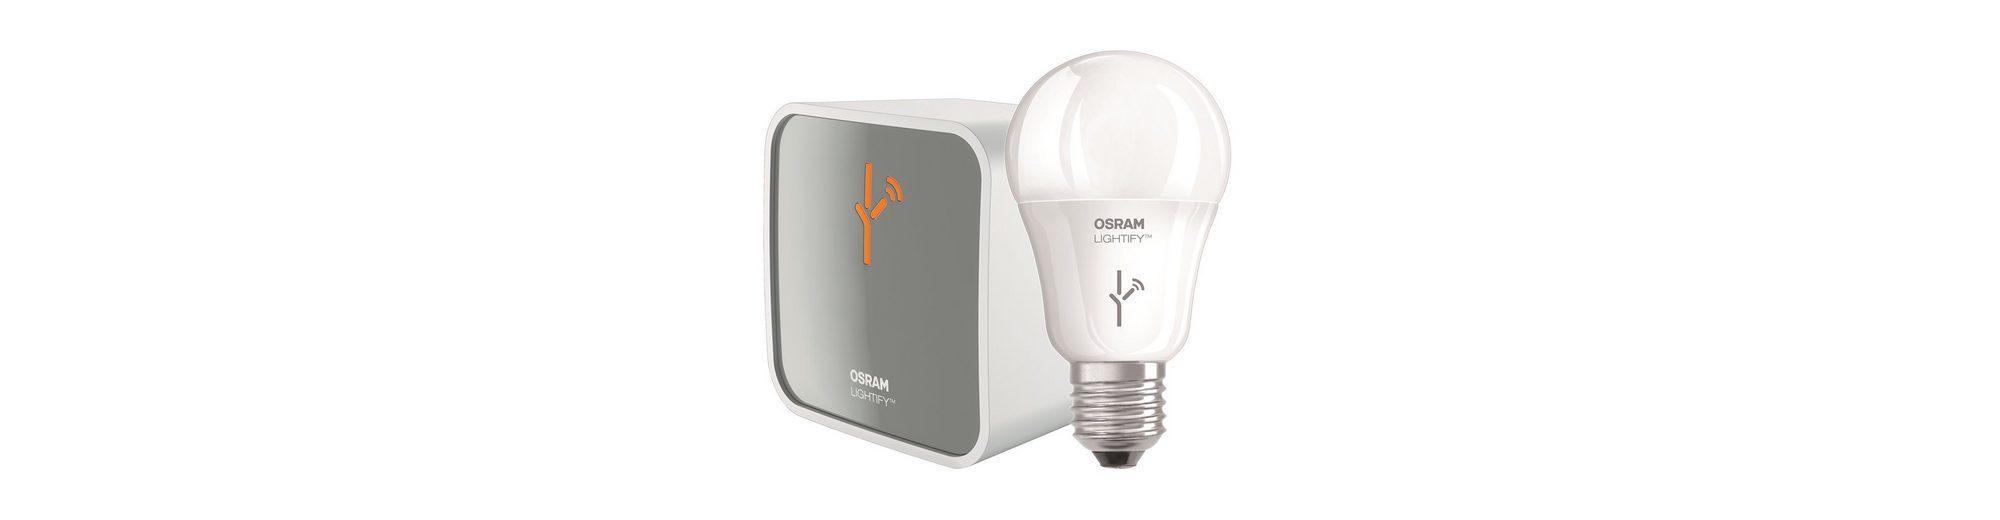 Osram Lightify Smart Home Starter Set »1xGateway + 1xCLA60 RGBW«